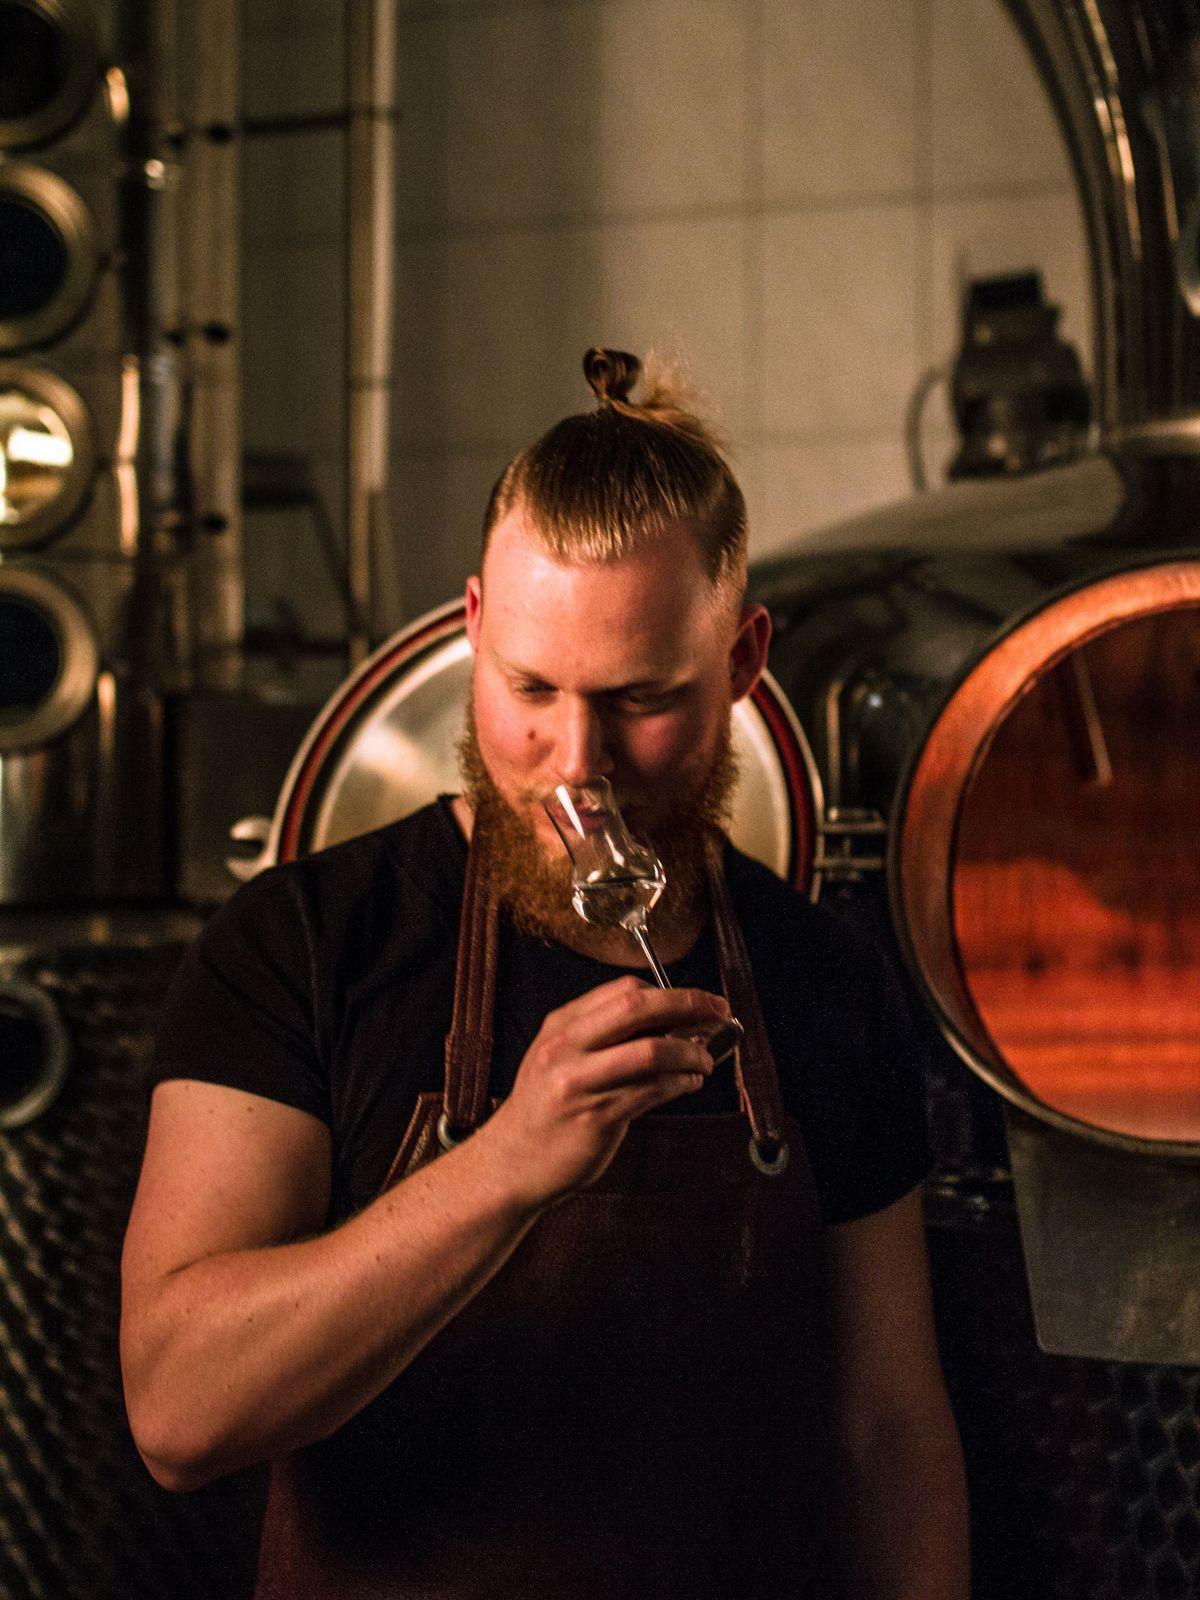 Felix Georg Kaltenthaler - Revolte Rum Dry Curacao - Zutat im Cocktail Set